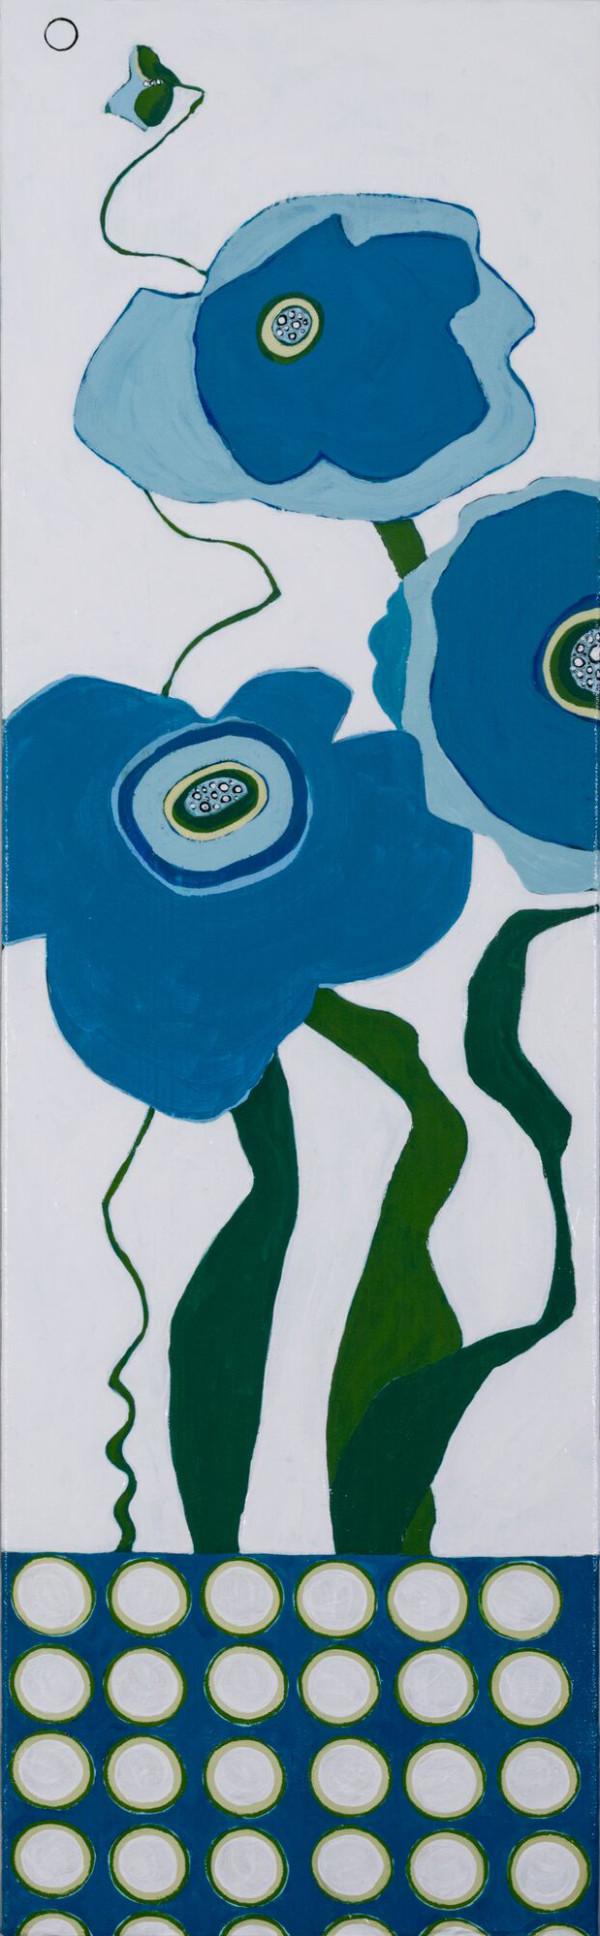 Blue Poppies from Home by Karen Tusinski